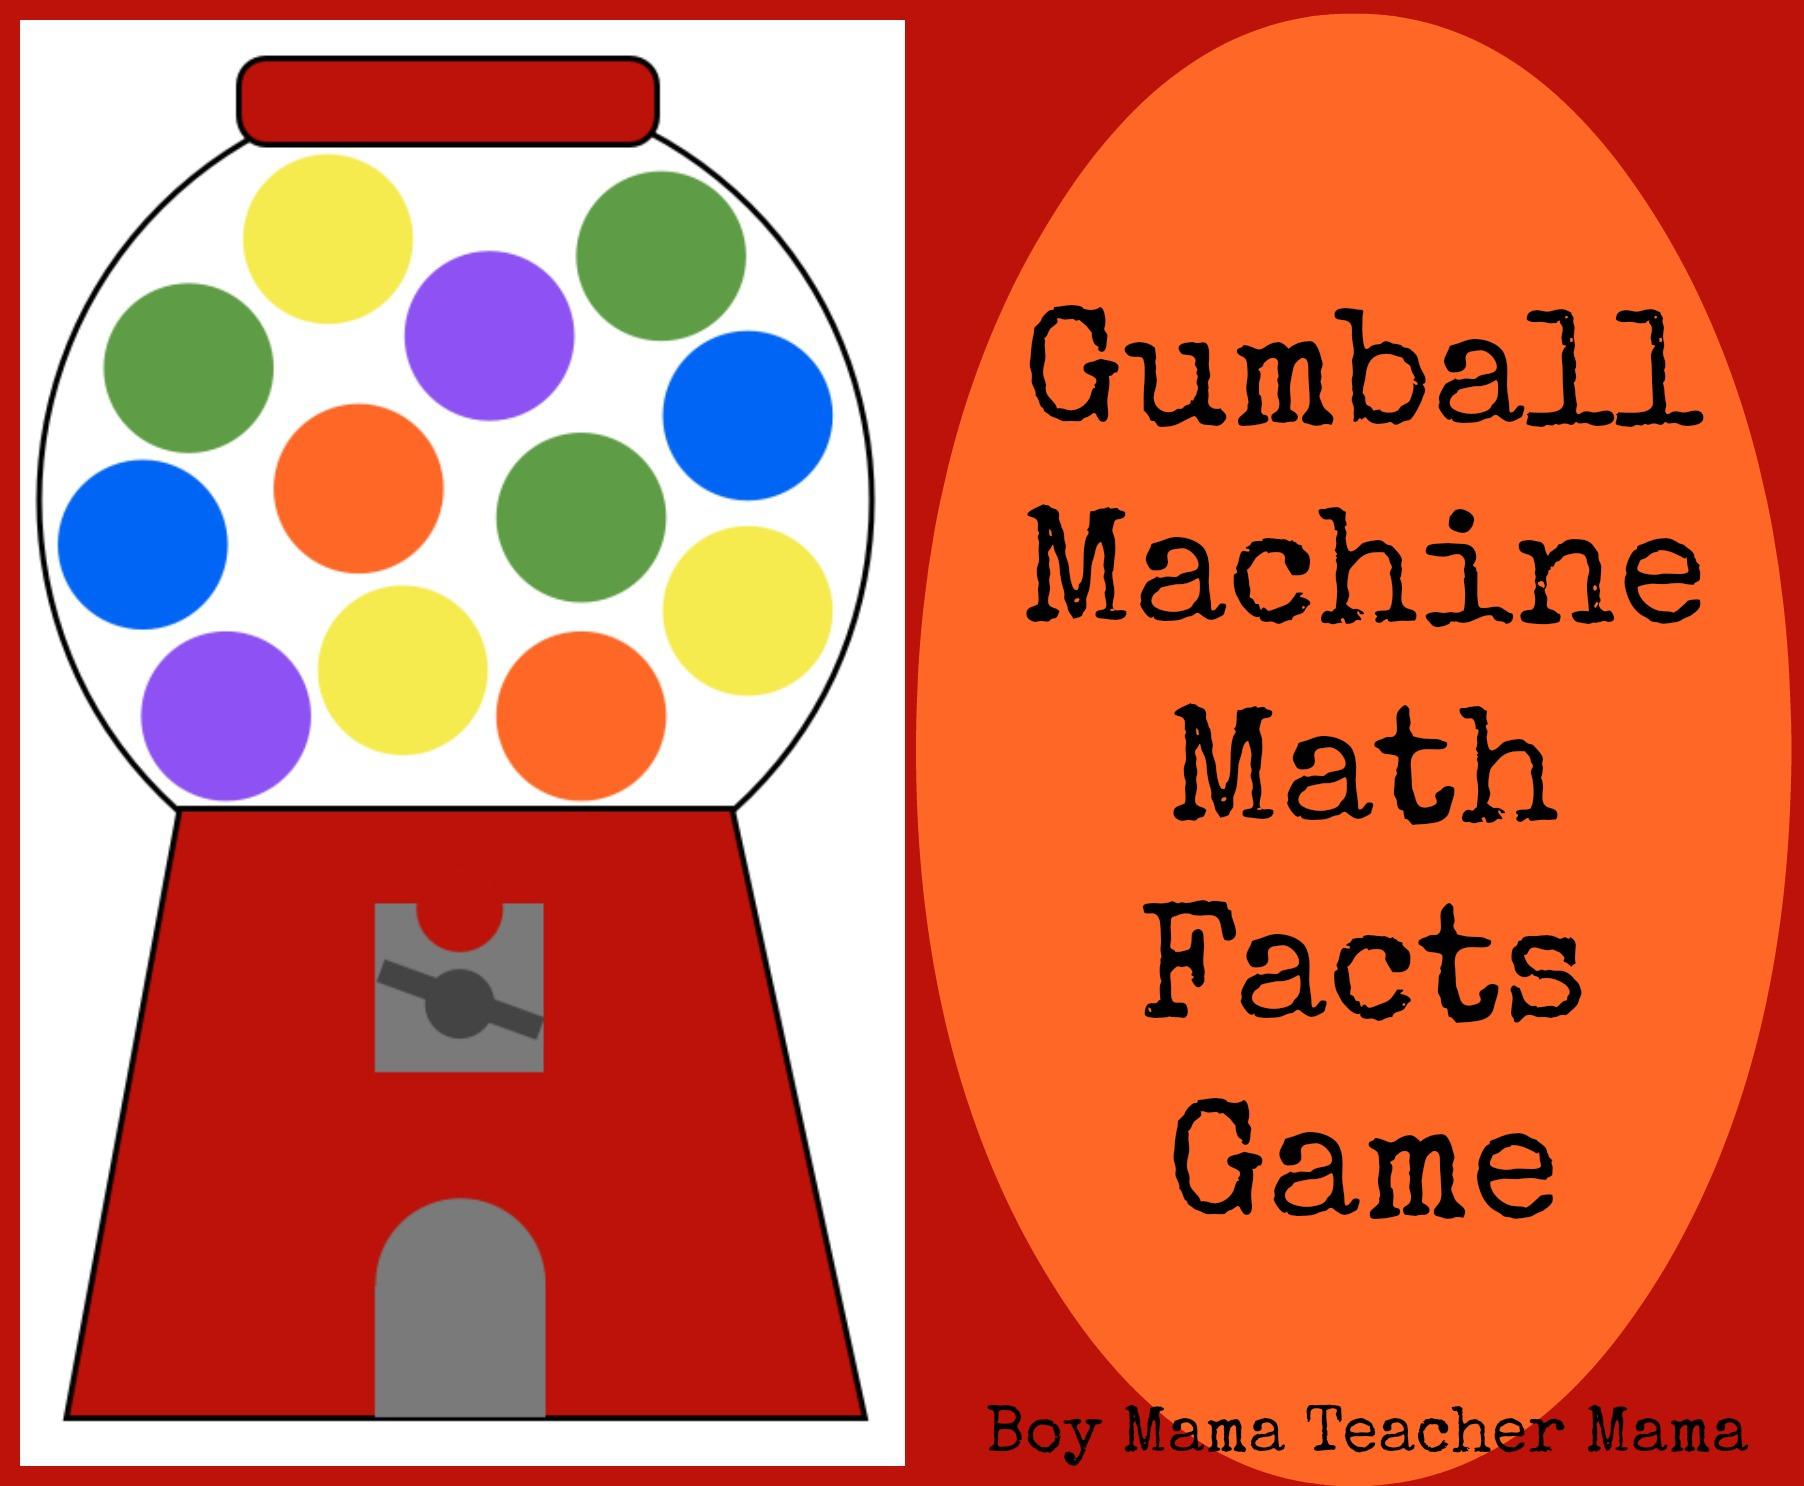 Teacher mama activities for practicing math factsa round up boy mama teacher mama gumball machine math facts game pronofoot35fo Images